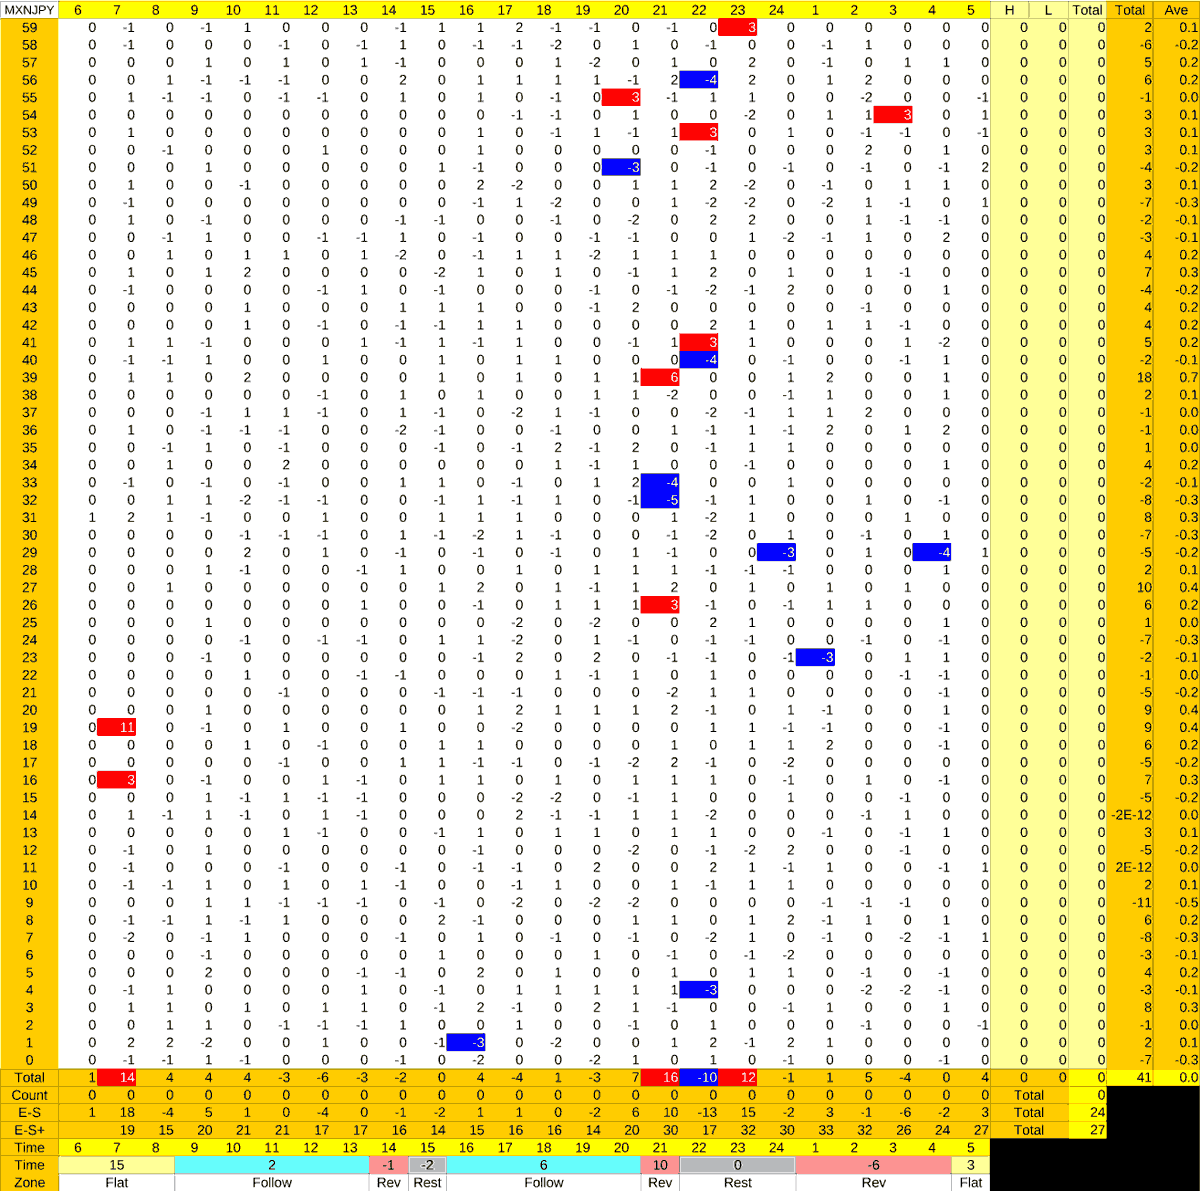 20210426_HS(3)MXNJPY